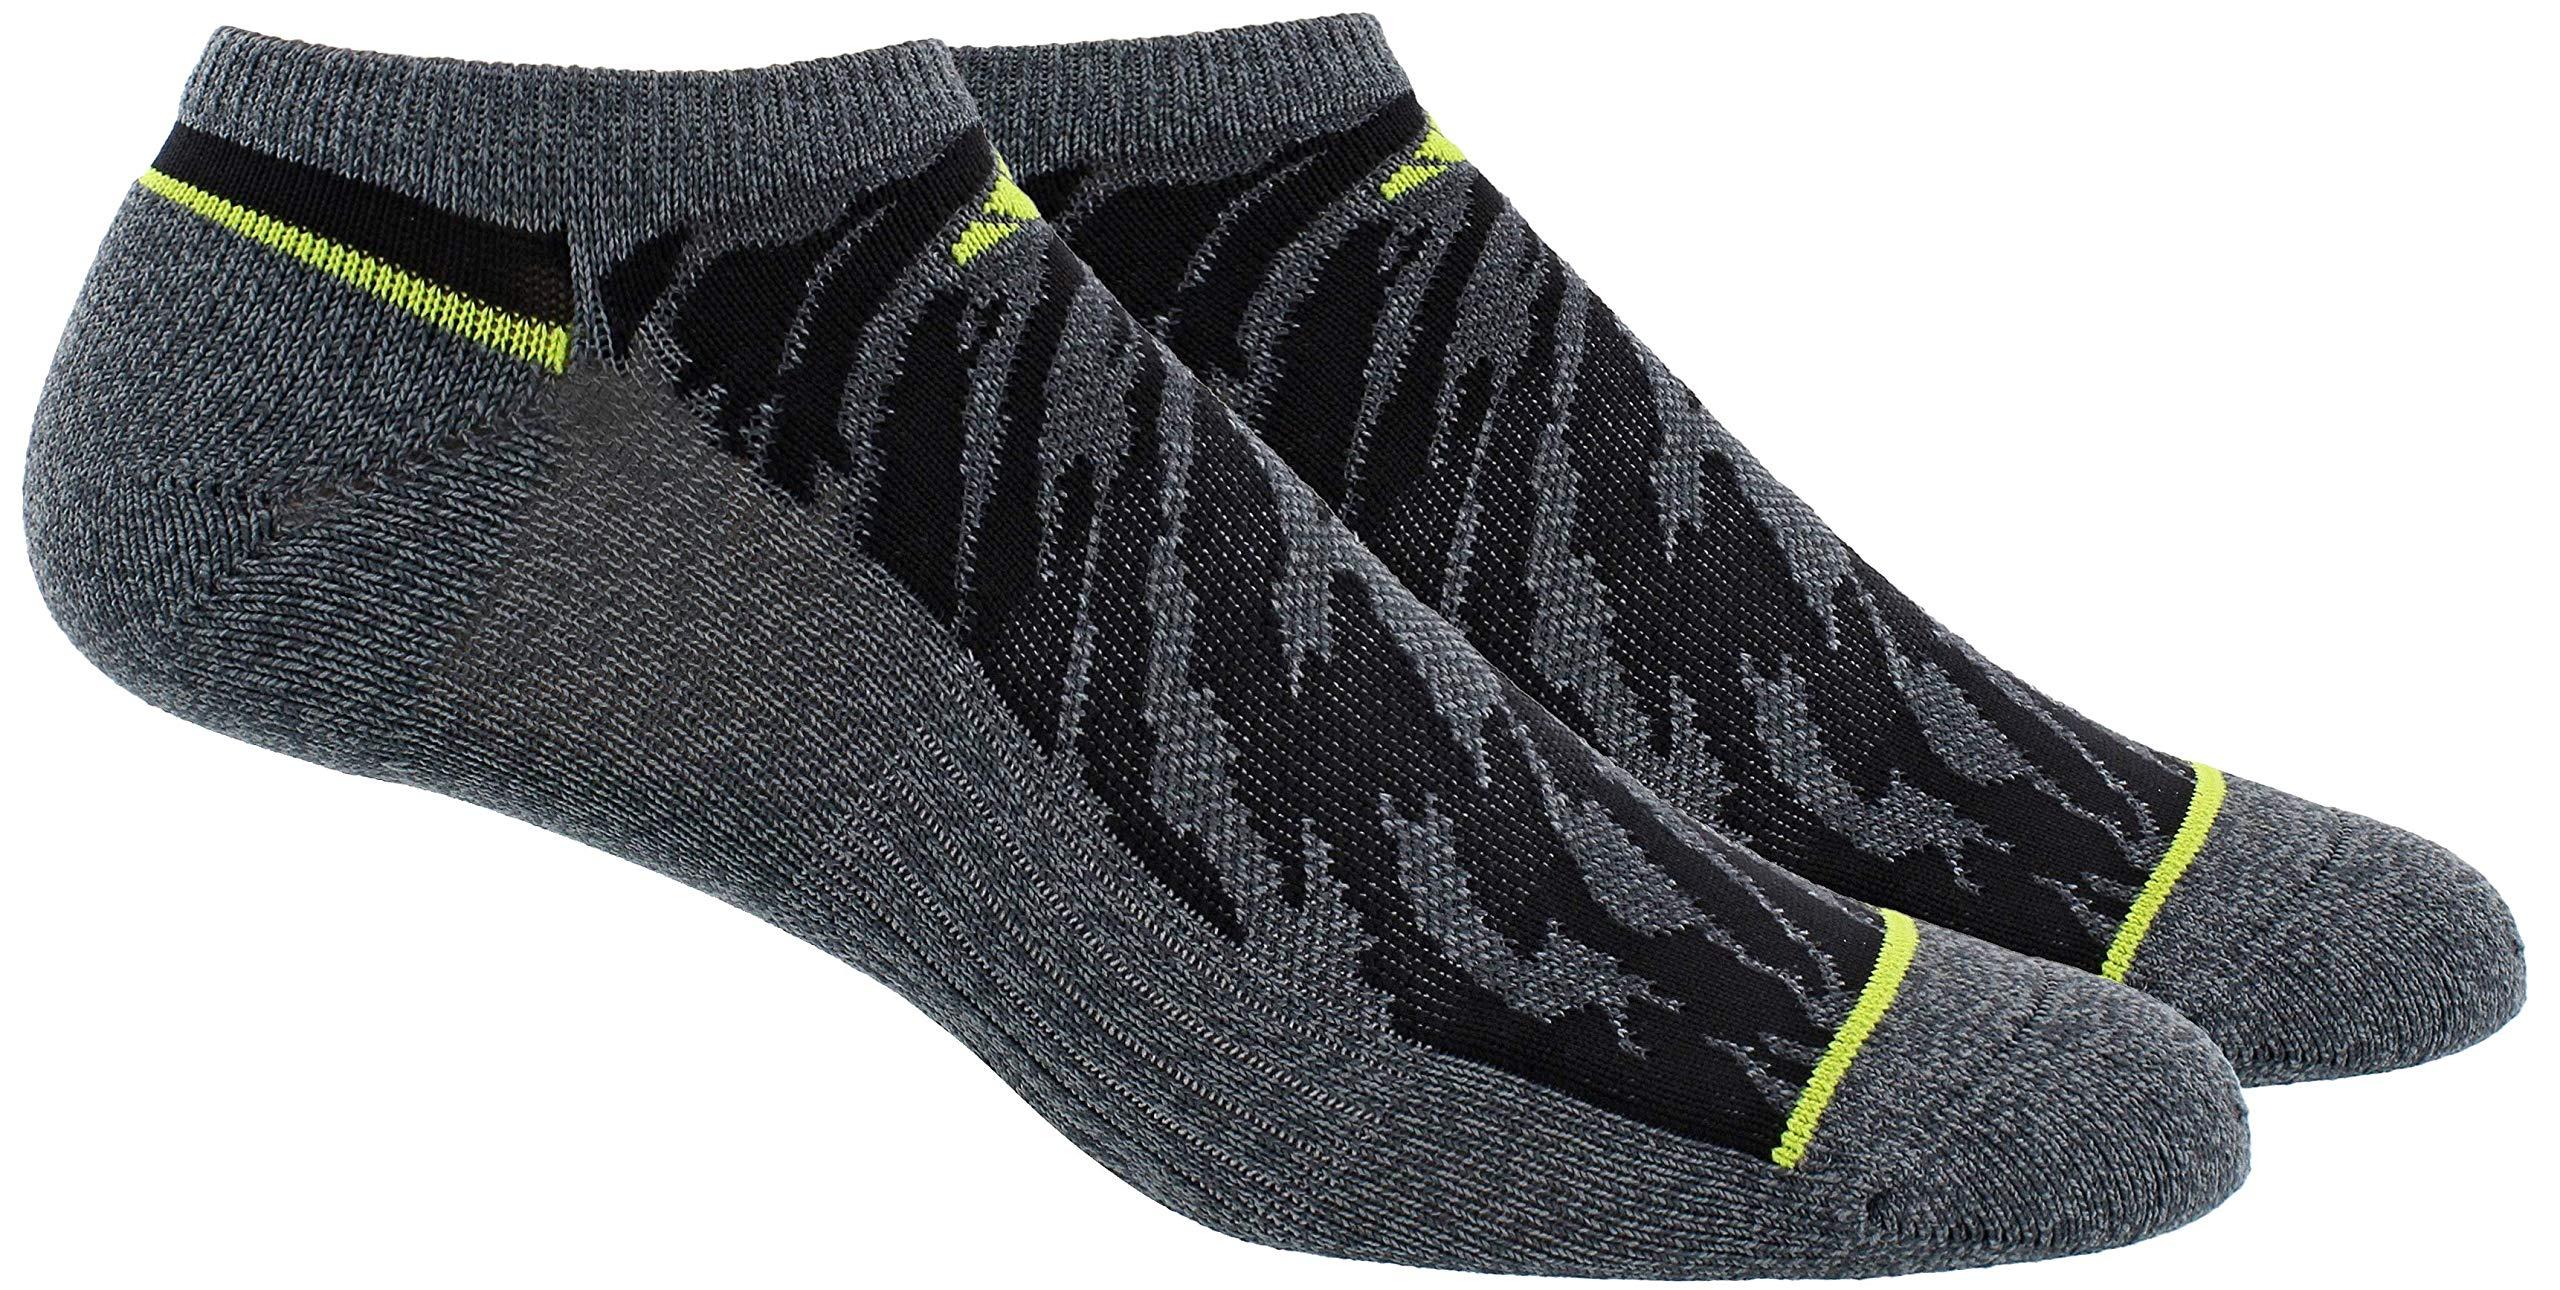 adidas Men's Superlite Prime Mesh No Show Sock (2-Pair), Dark Grey - Vista Grey Marl/Black/Semi Solar Yellow, Large, (Shoe Size 6-12) by adidas